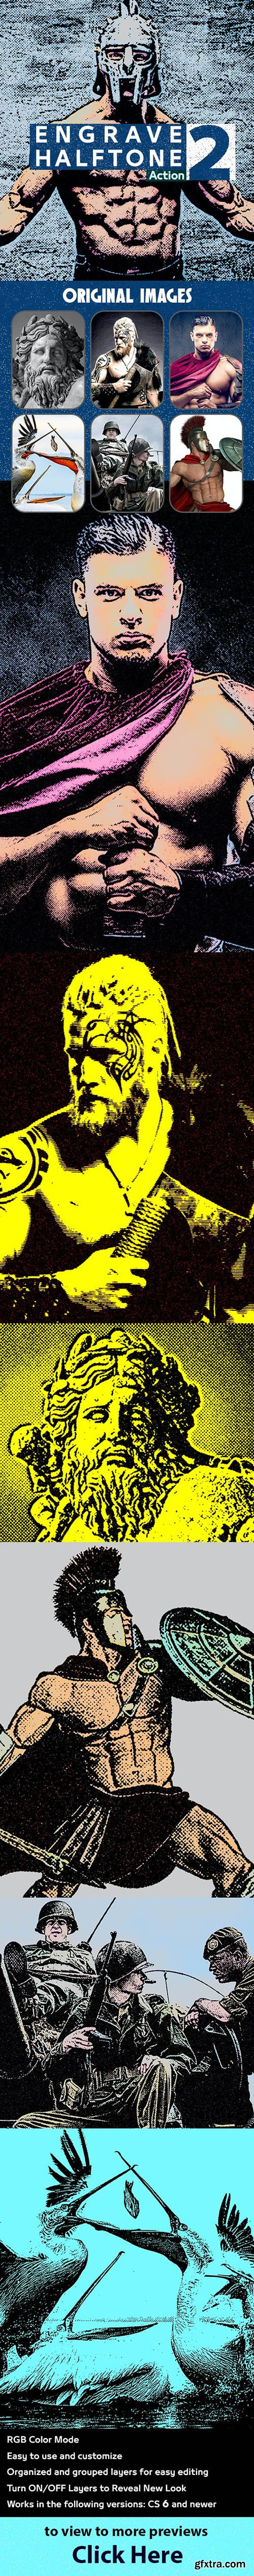 GraphicRiver - Engrave Halftone Action 2 28118009